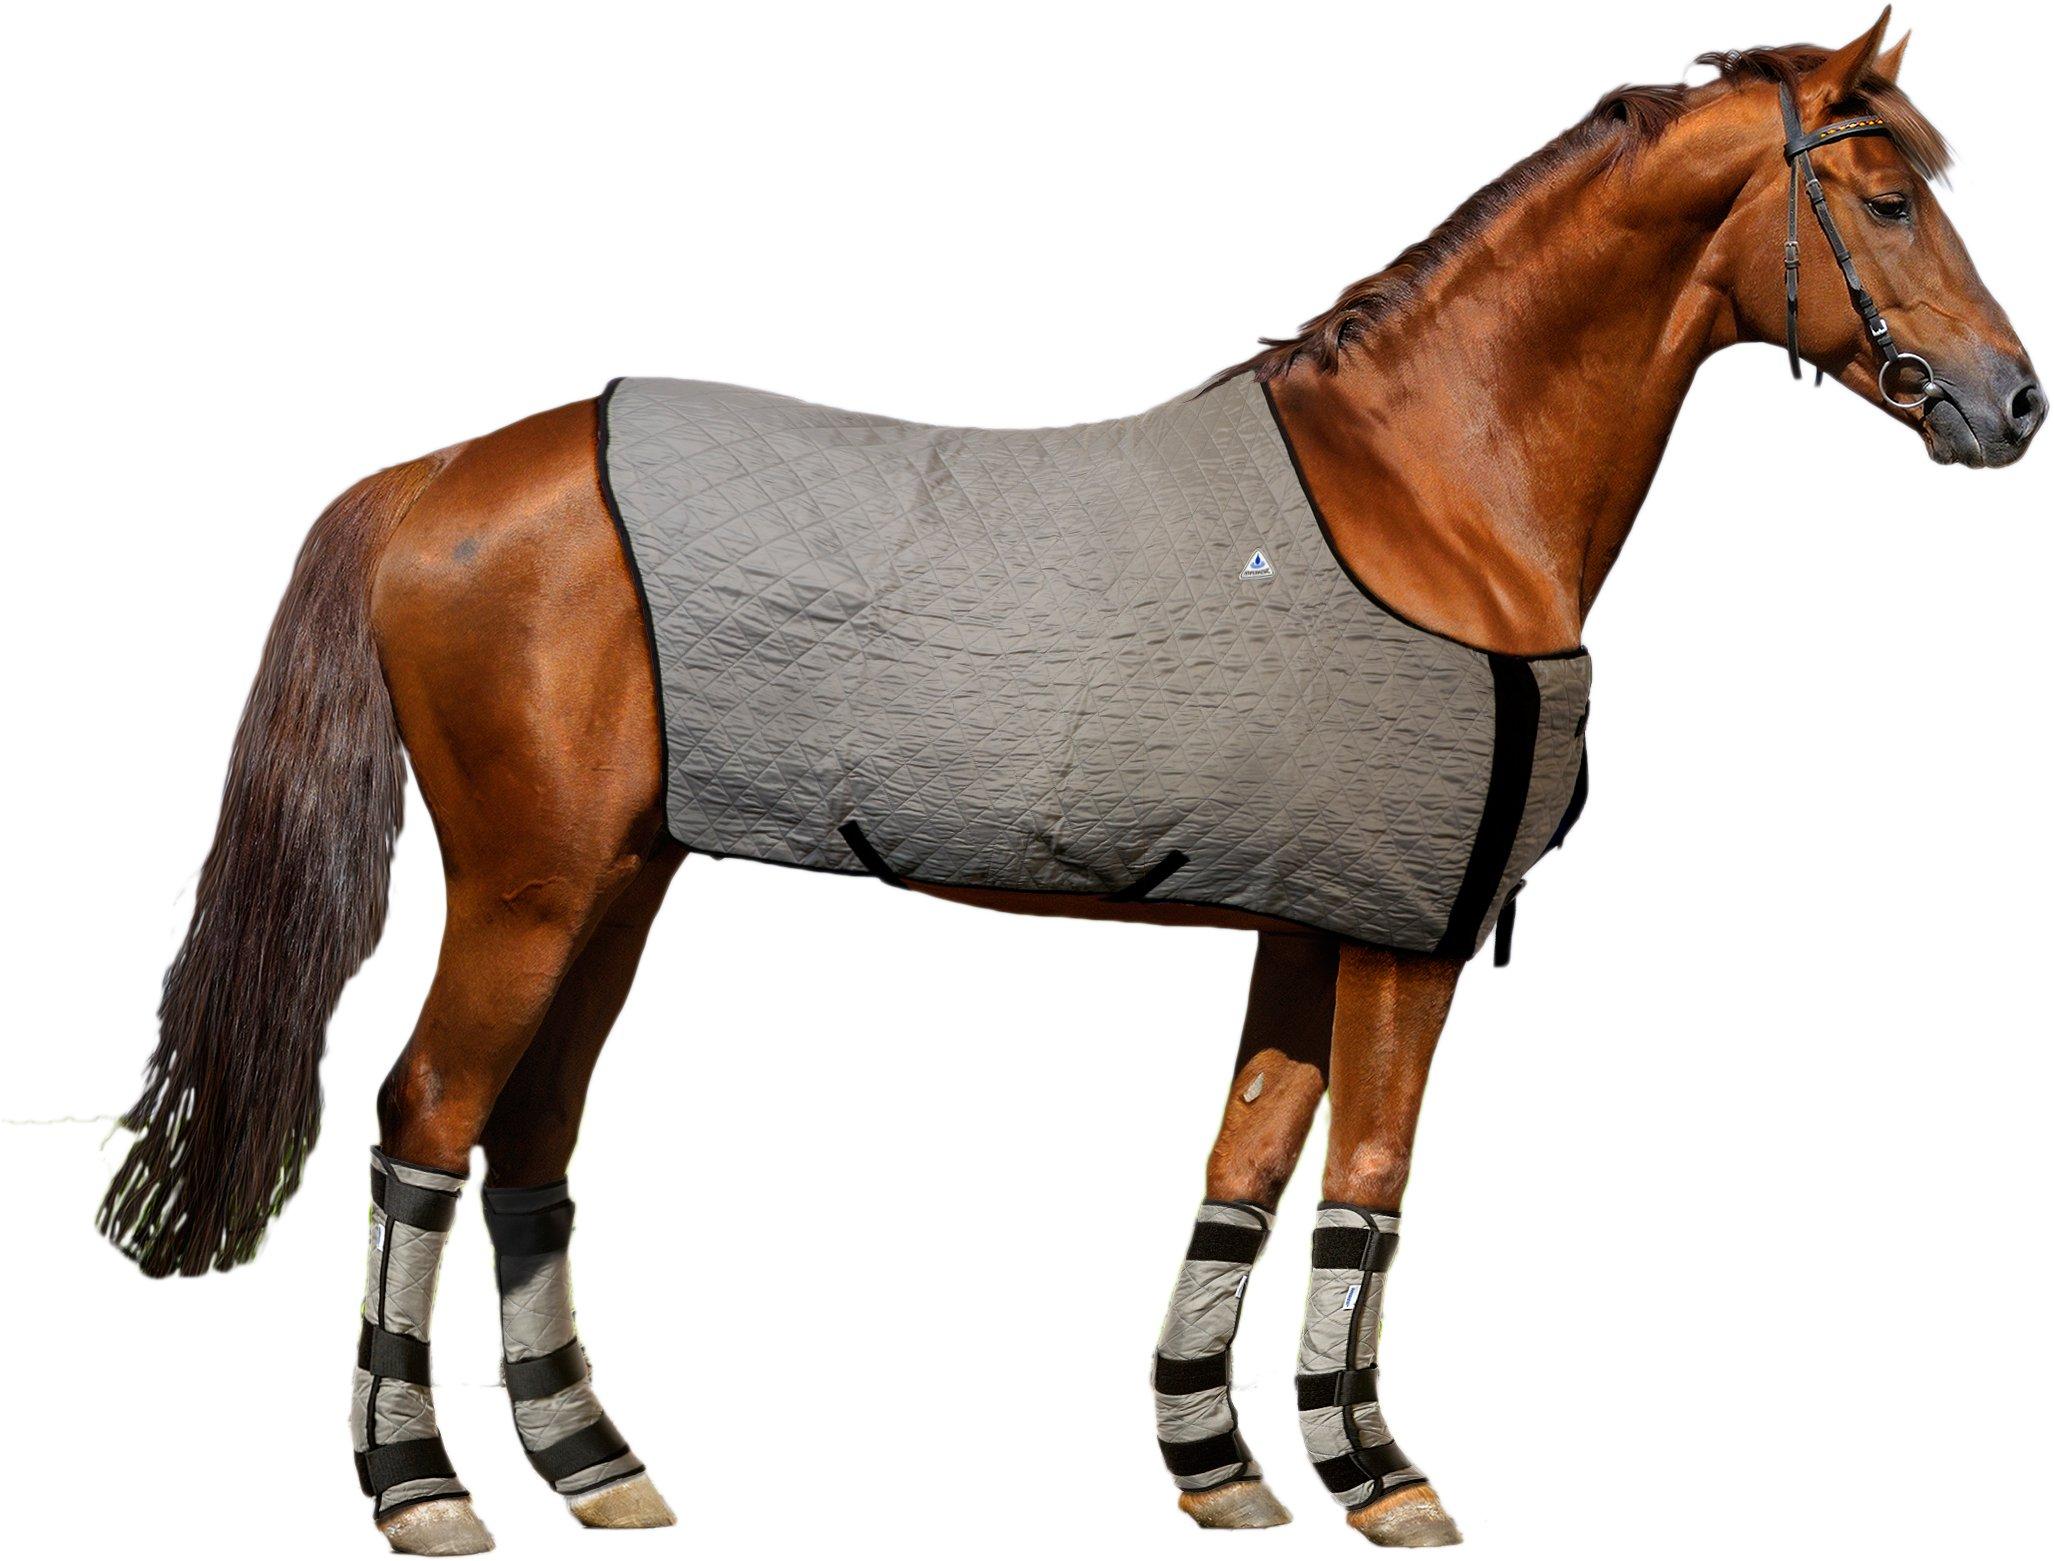 HyperKewl Evaporative Cooling Horse Blanket, Large, Silver